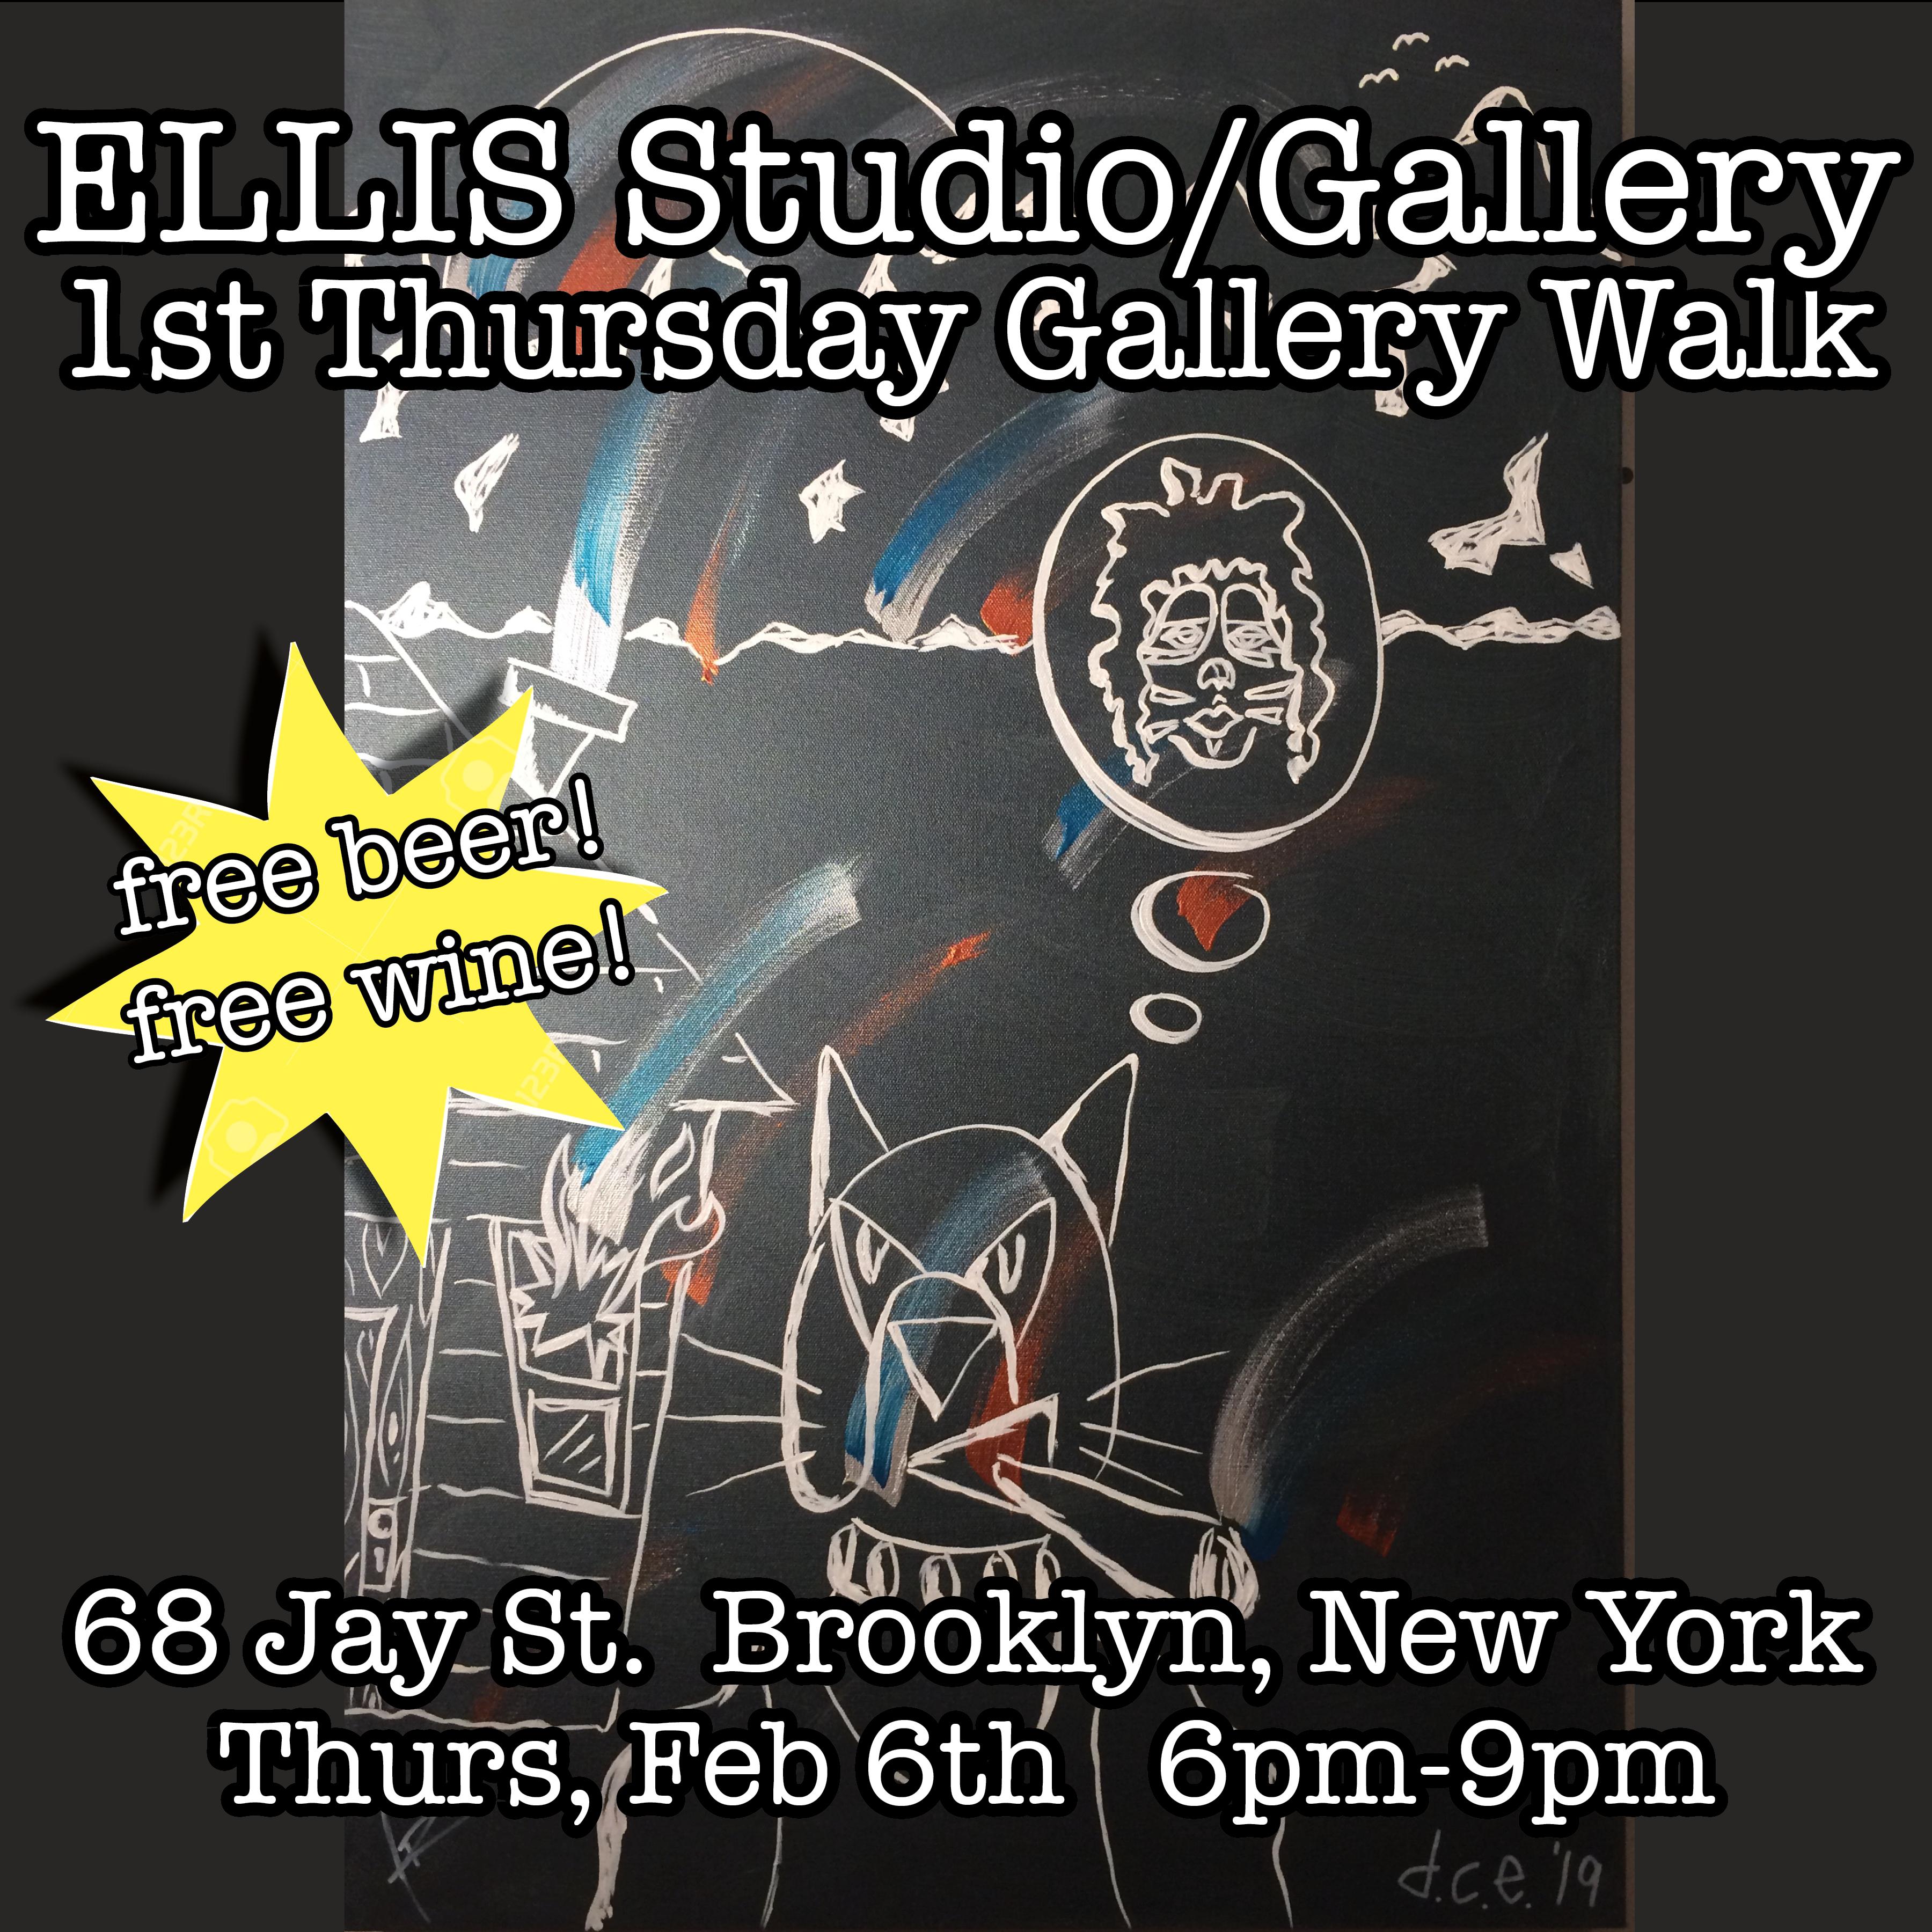 February Gallery Walk